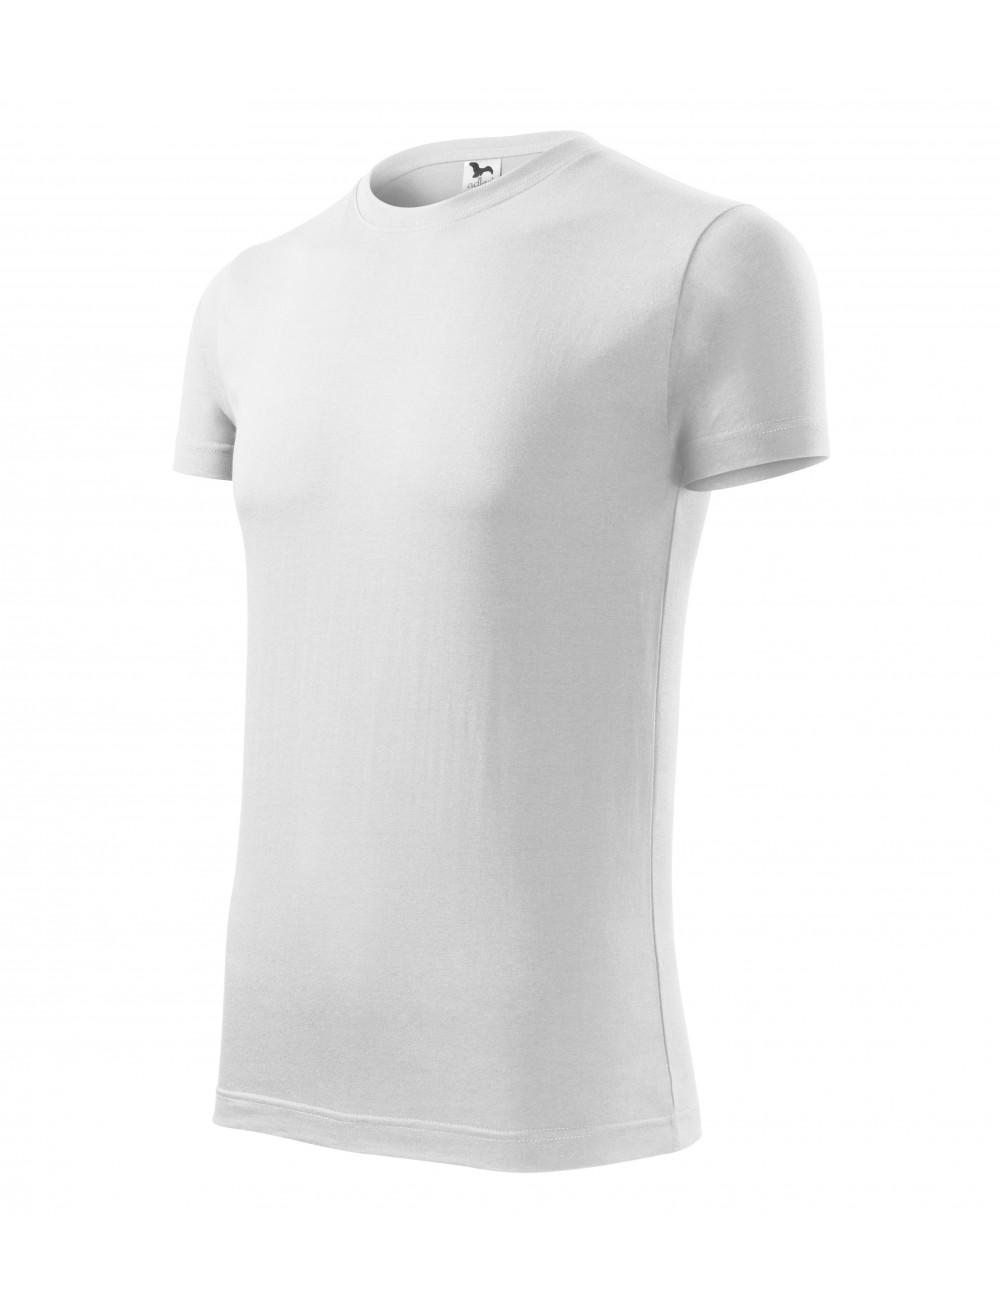 Adler MALFINI Koszulka męska Viper 143 biały